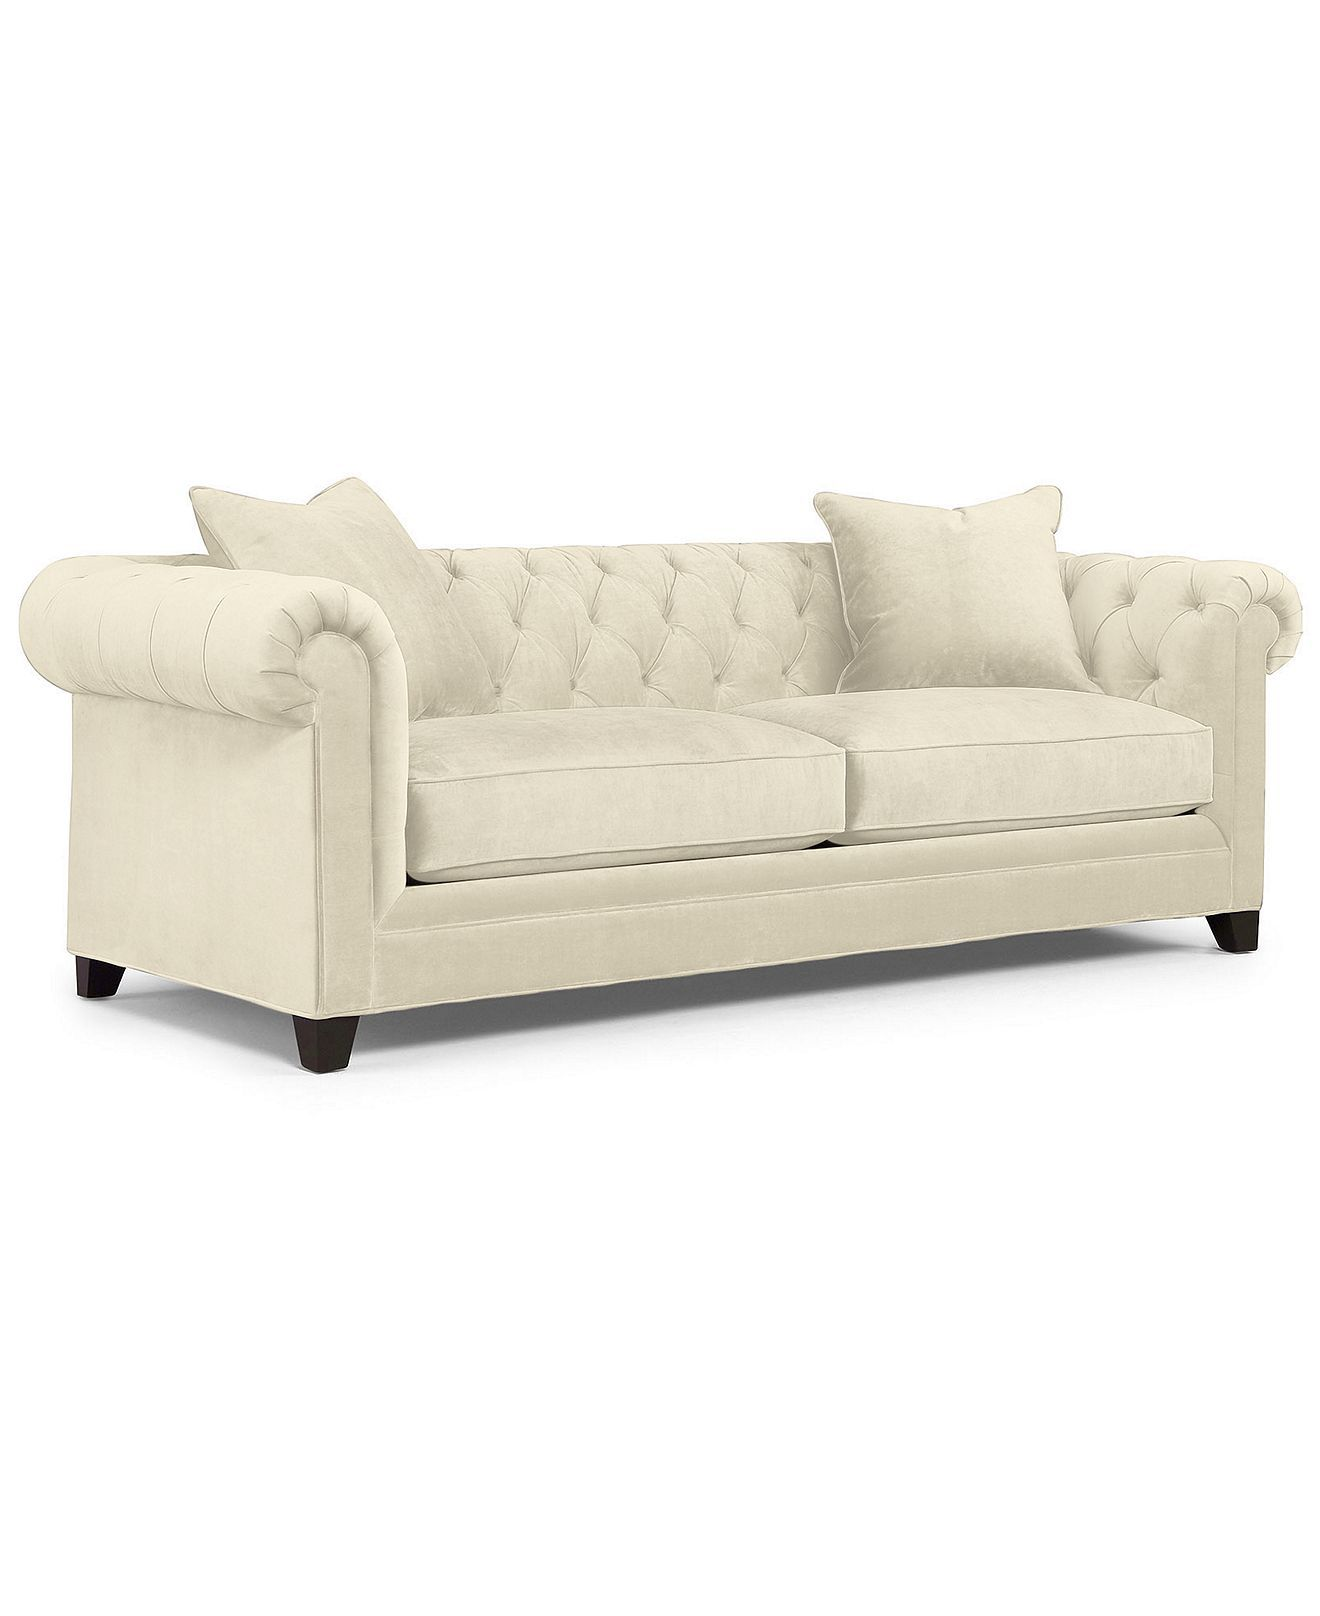 martha stewart saybridge sofa score mortality pdf 92 fabric custom colors created for macy